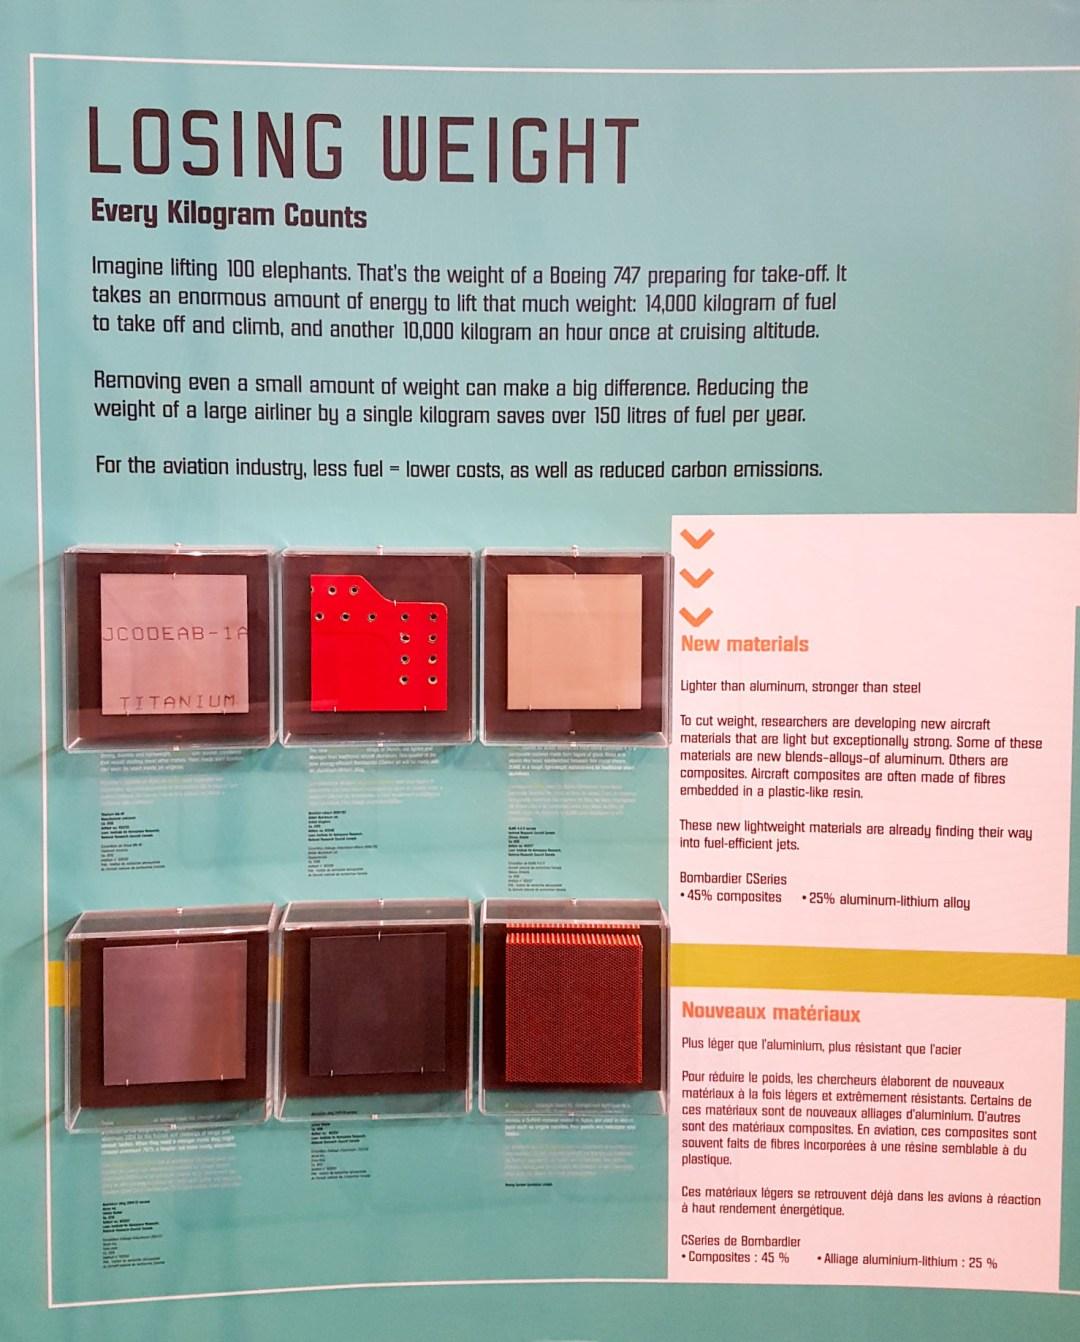 Losing Weight display